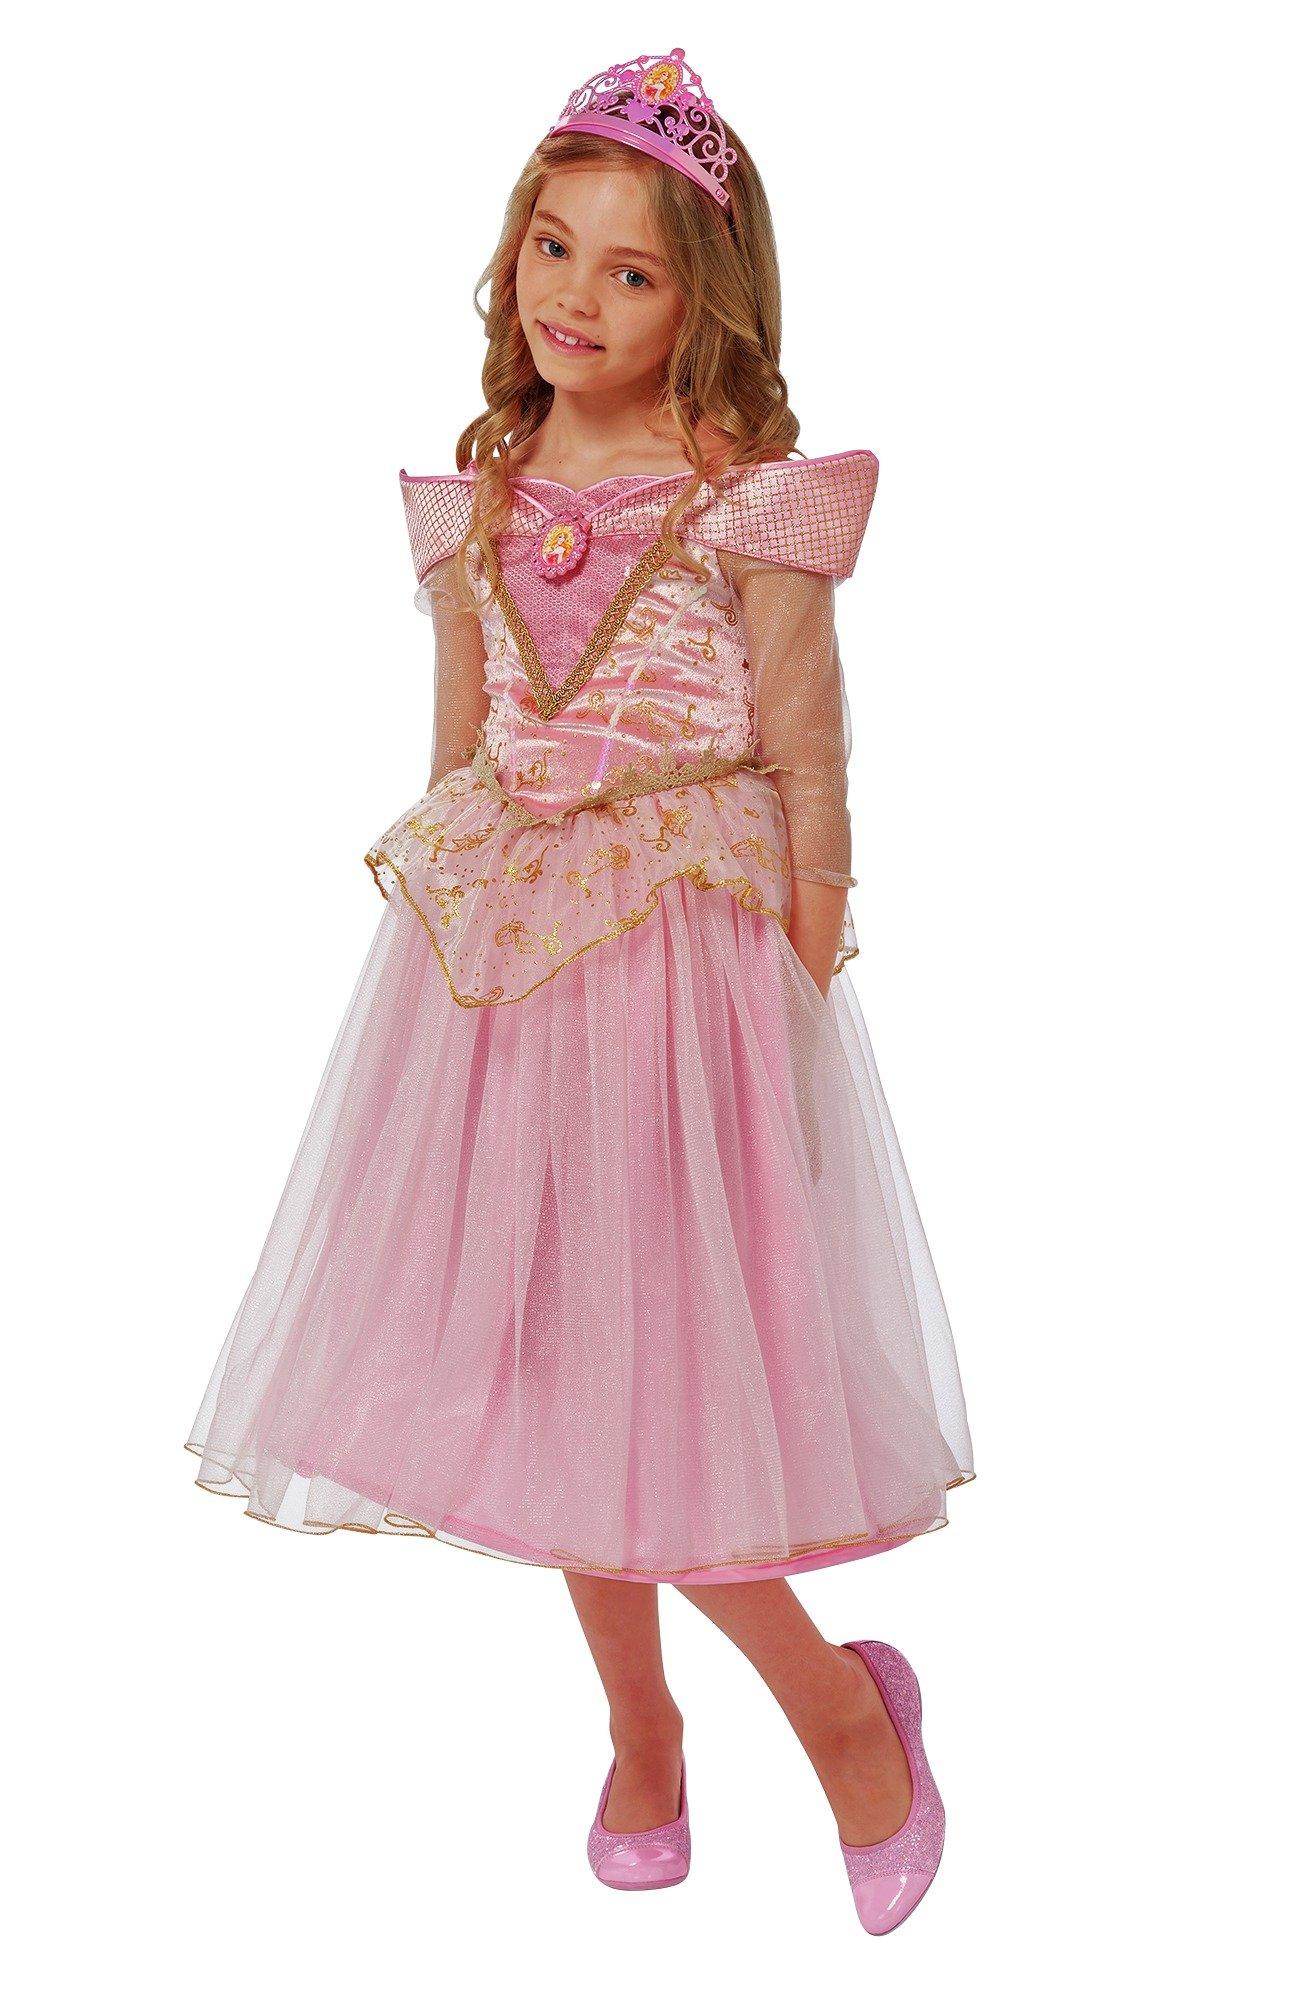 50cef7dc0a72e Disney Sleeping Beauty Fancy Dress Costume - 3-4 Years (7098352) | Argos  Price Tracker | pricehistory.co.uk